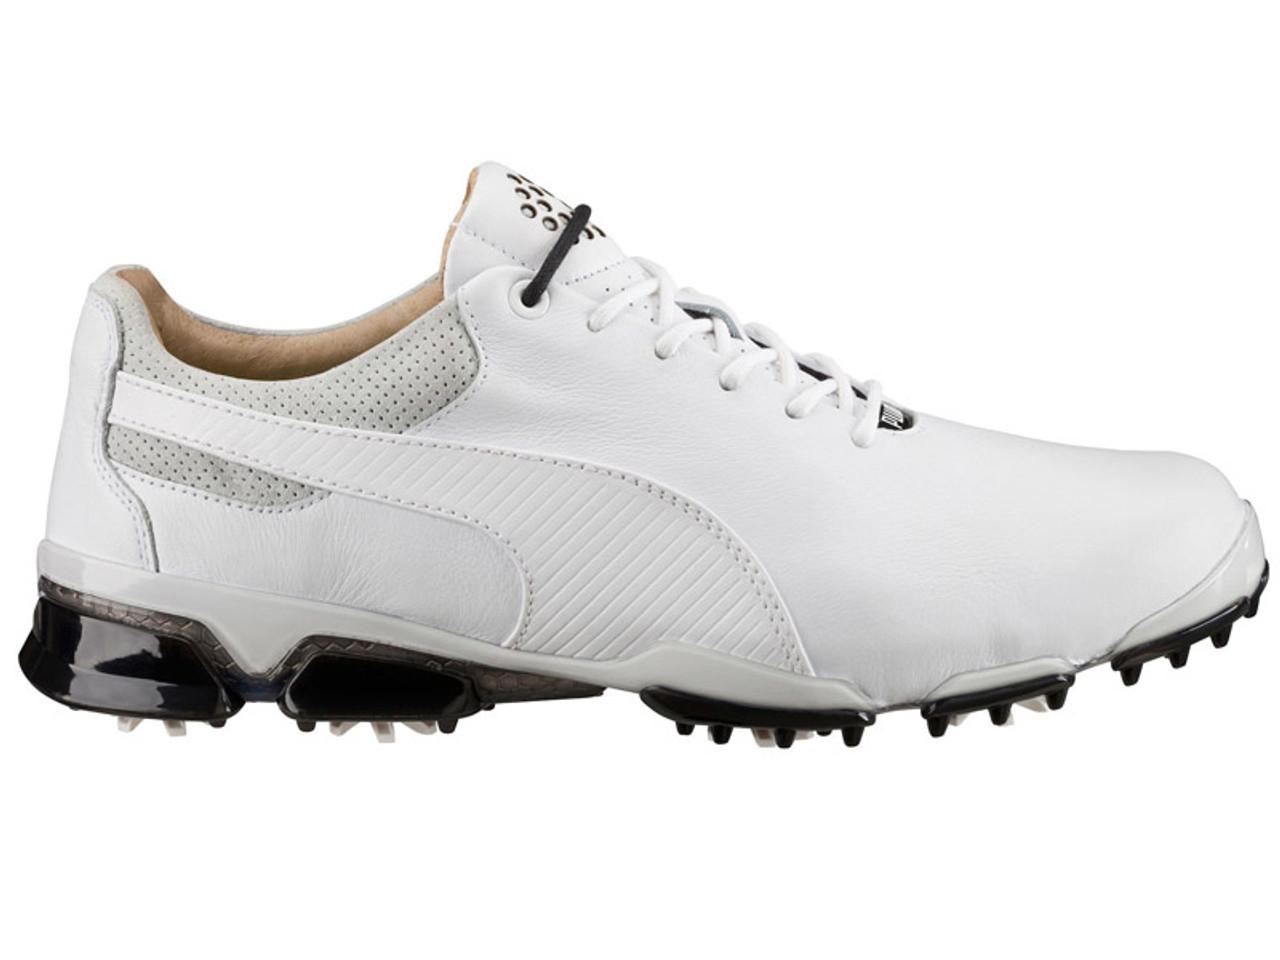 7119b11c01be Puma Titan Tour Ignite Premium Golf Shoes - White - Mens For Sale ...